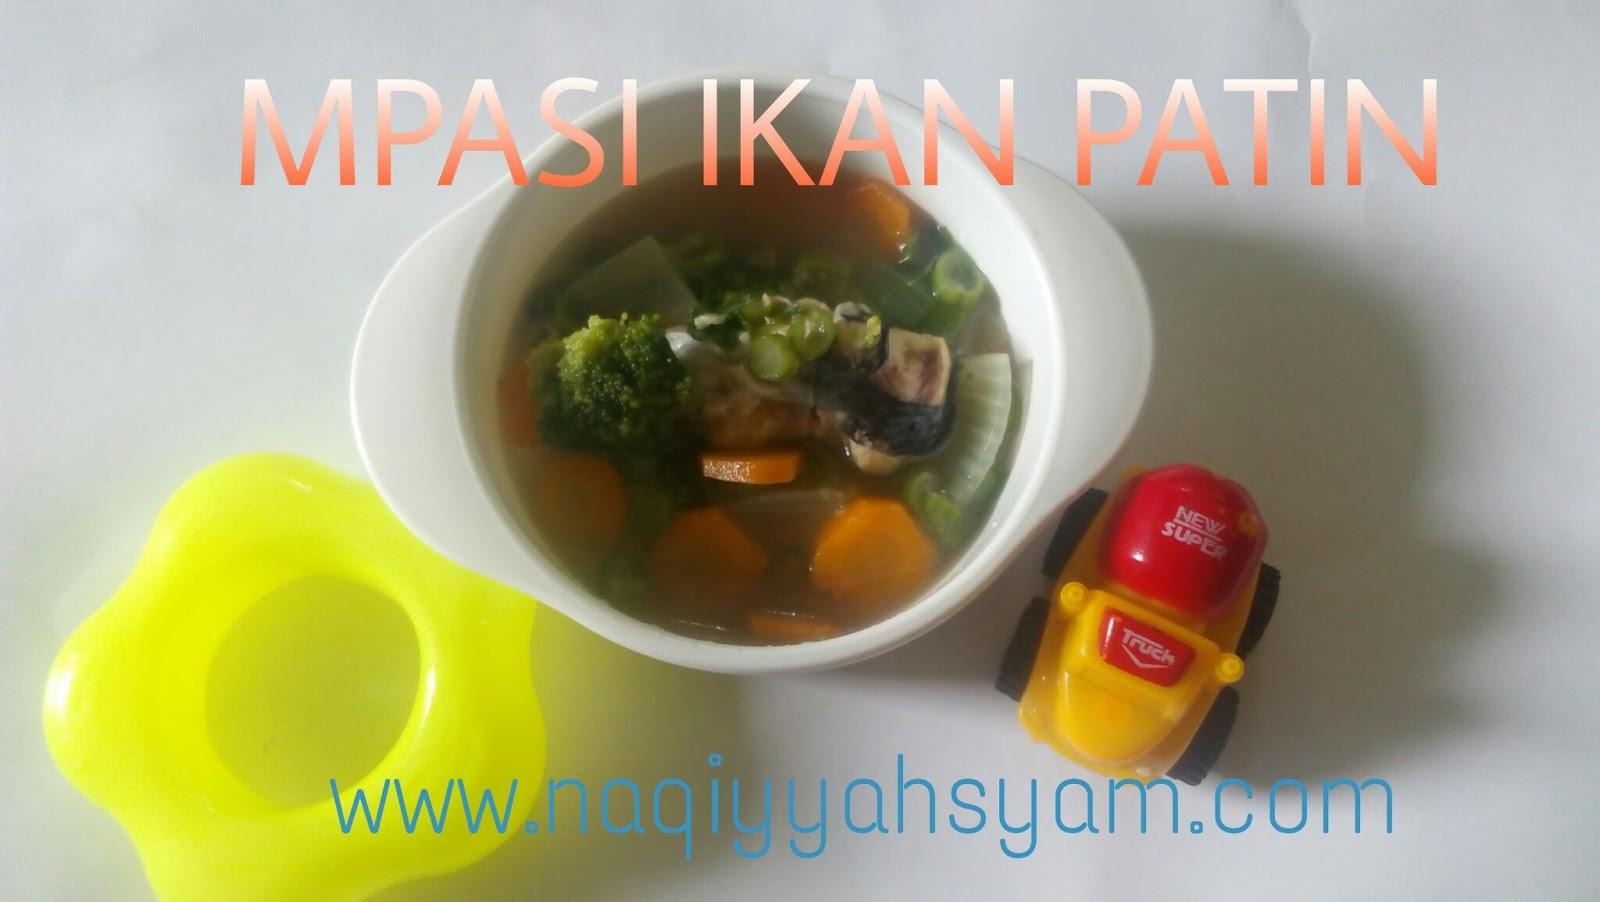 Naqiyyah Syam I Blogger Parenting Dan Lifestyle Lampung Resep Mpasi 1 Tahun Ikan Patin Wortel Buncis Dan Brokoli